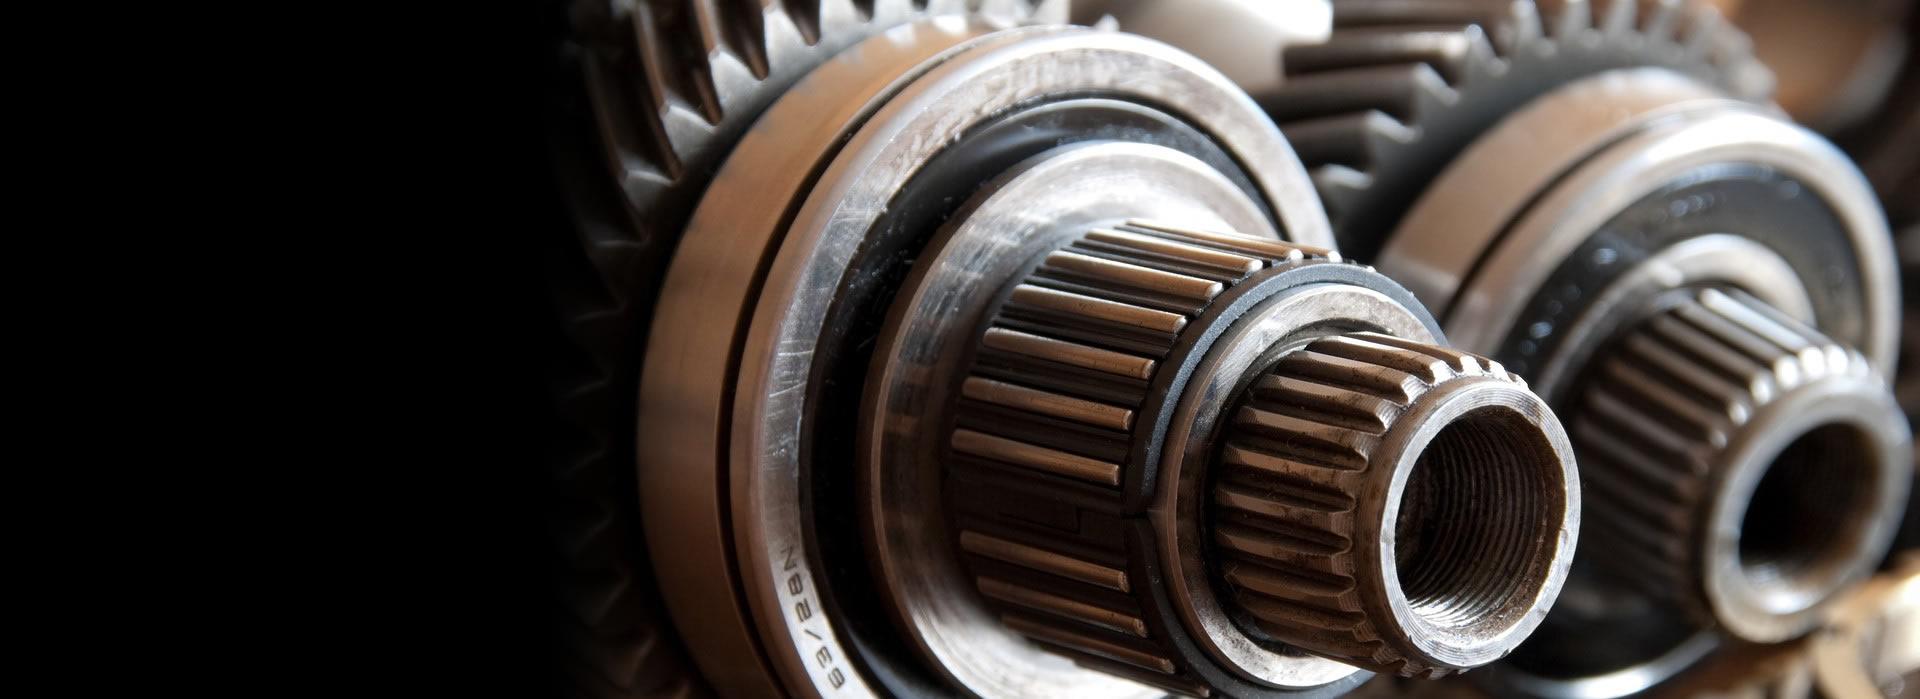 portland-transmission-repair-slide-03